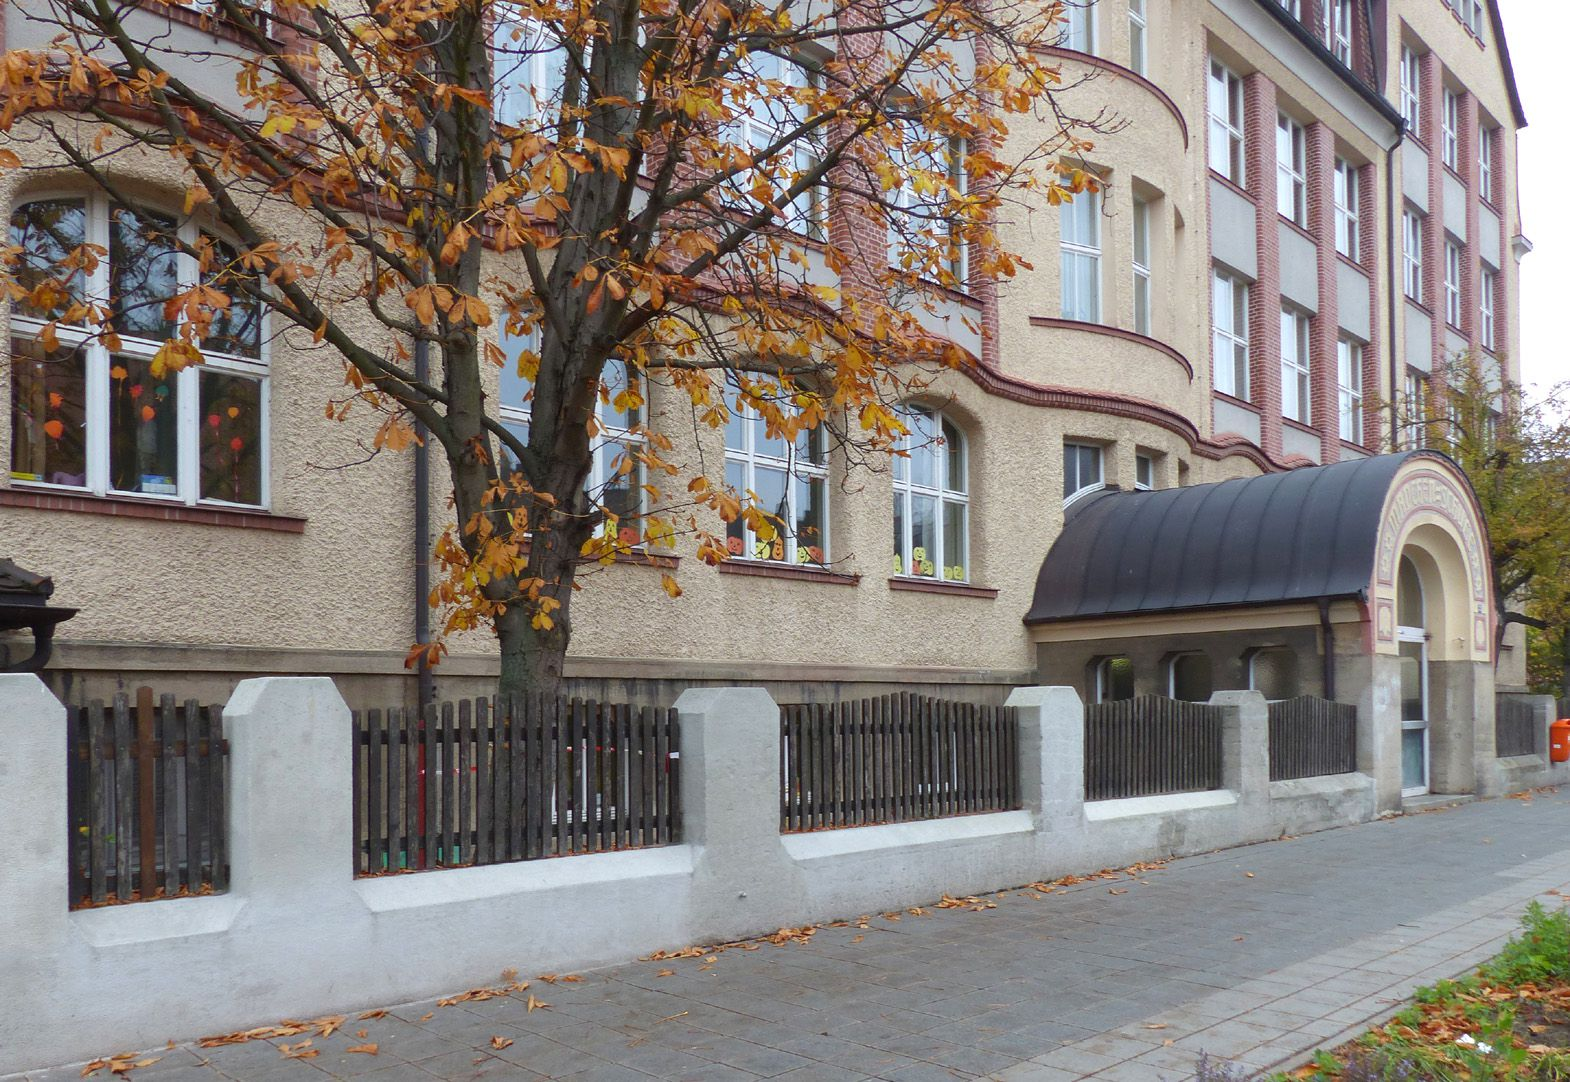 Scharrer-School Street view with entrance to the girls´school